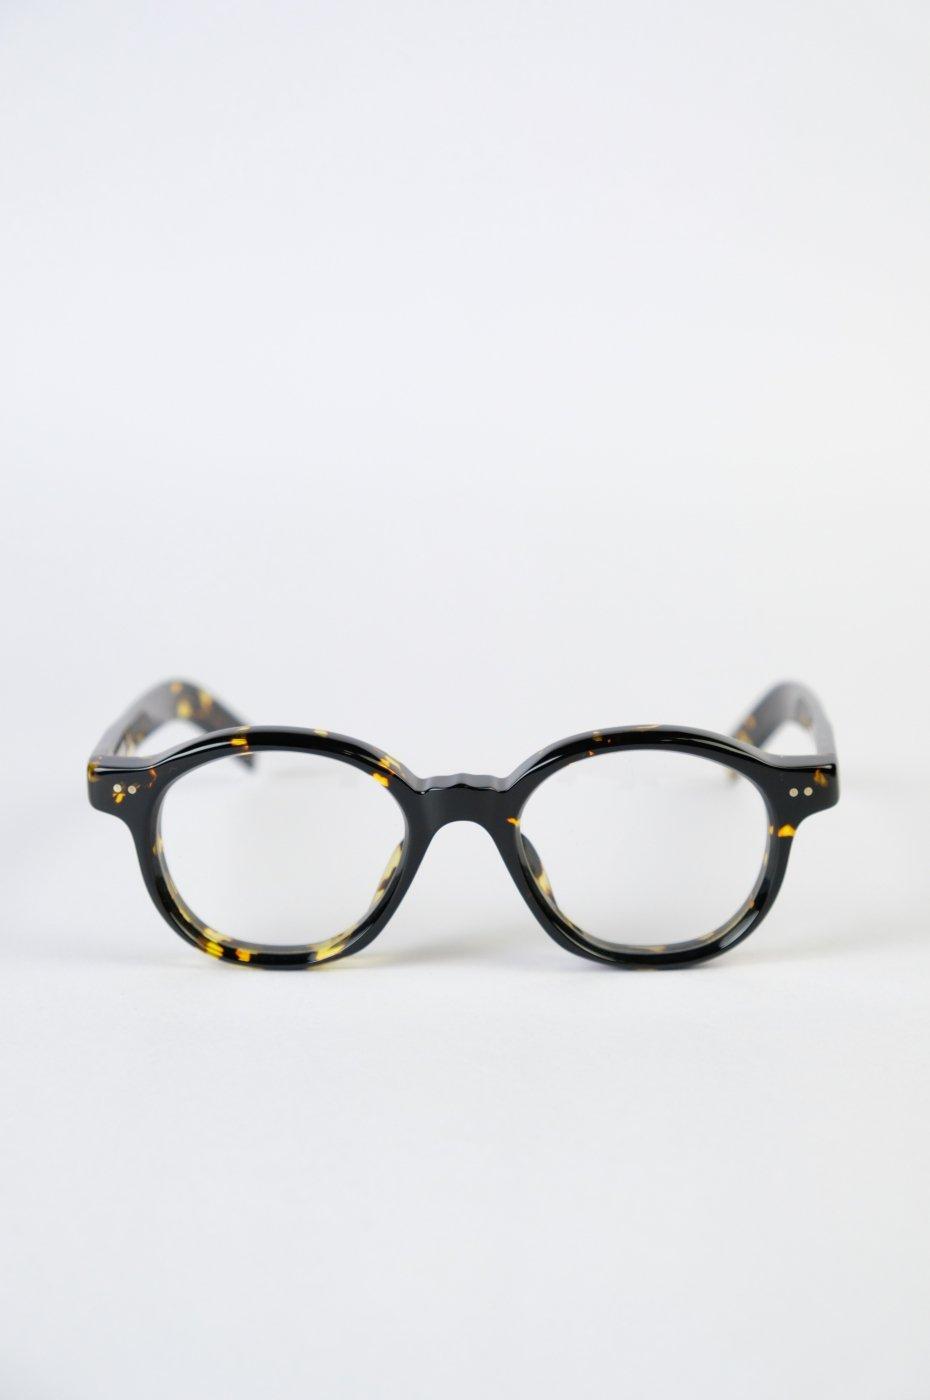 guépard ギュパール-gp-10-Écaille-Clear Lens-